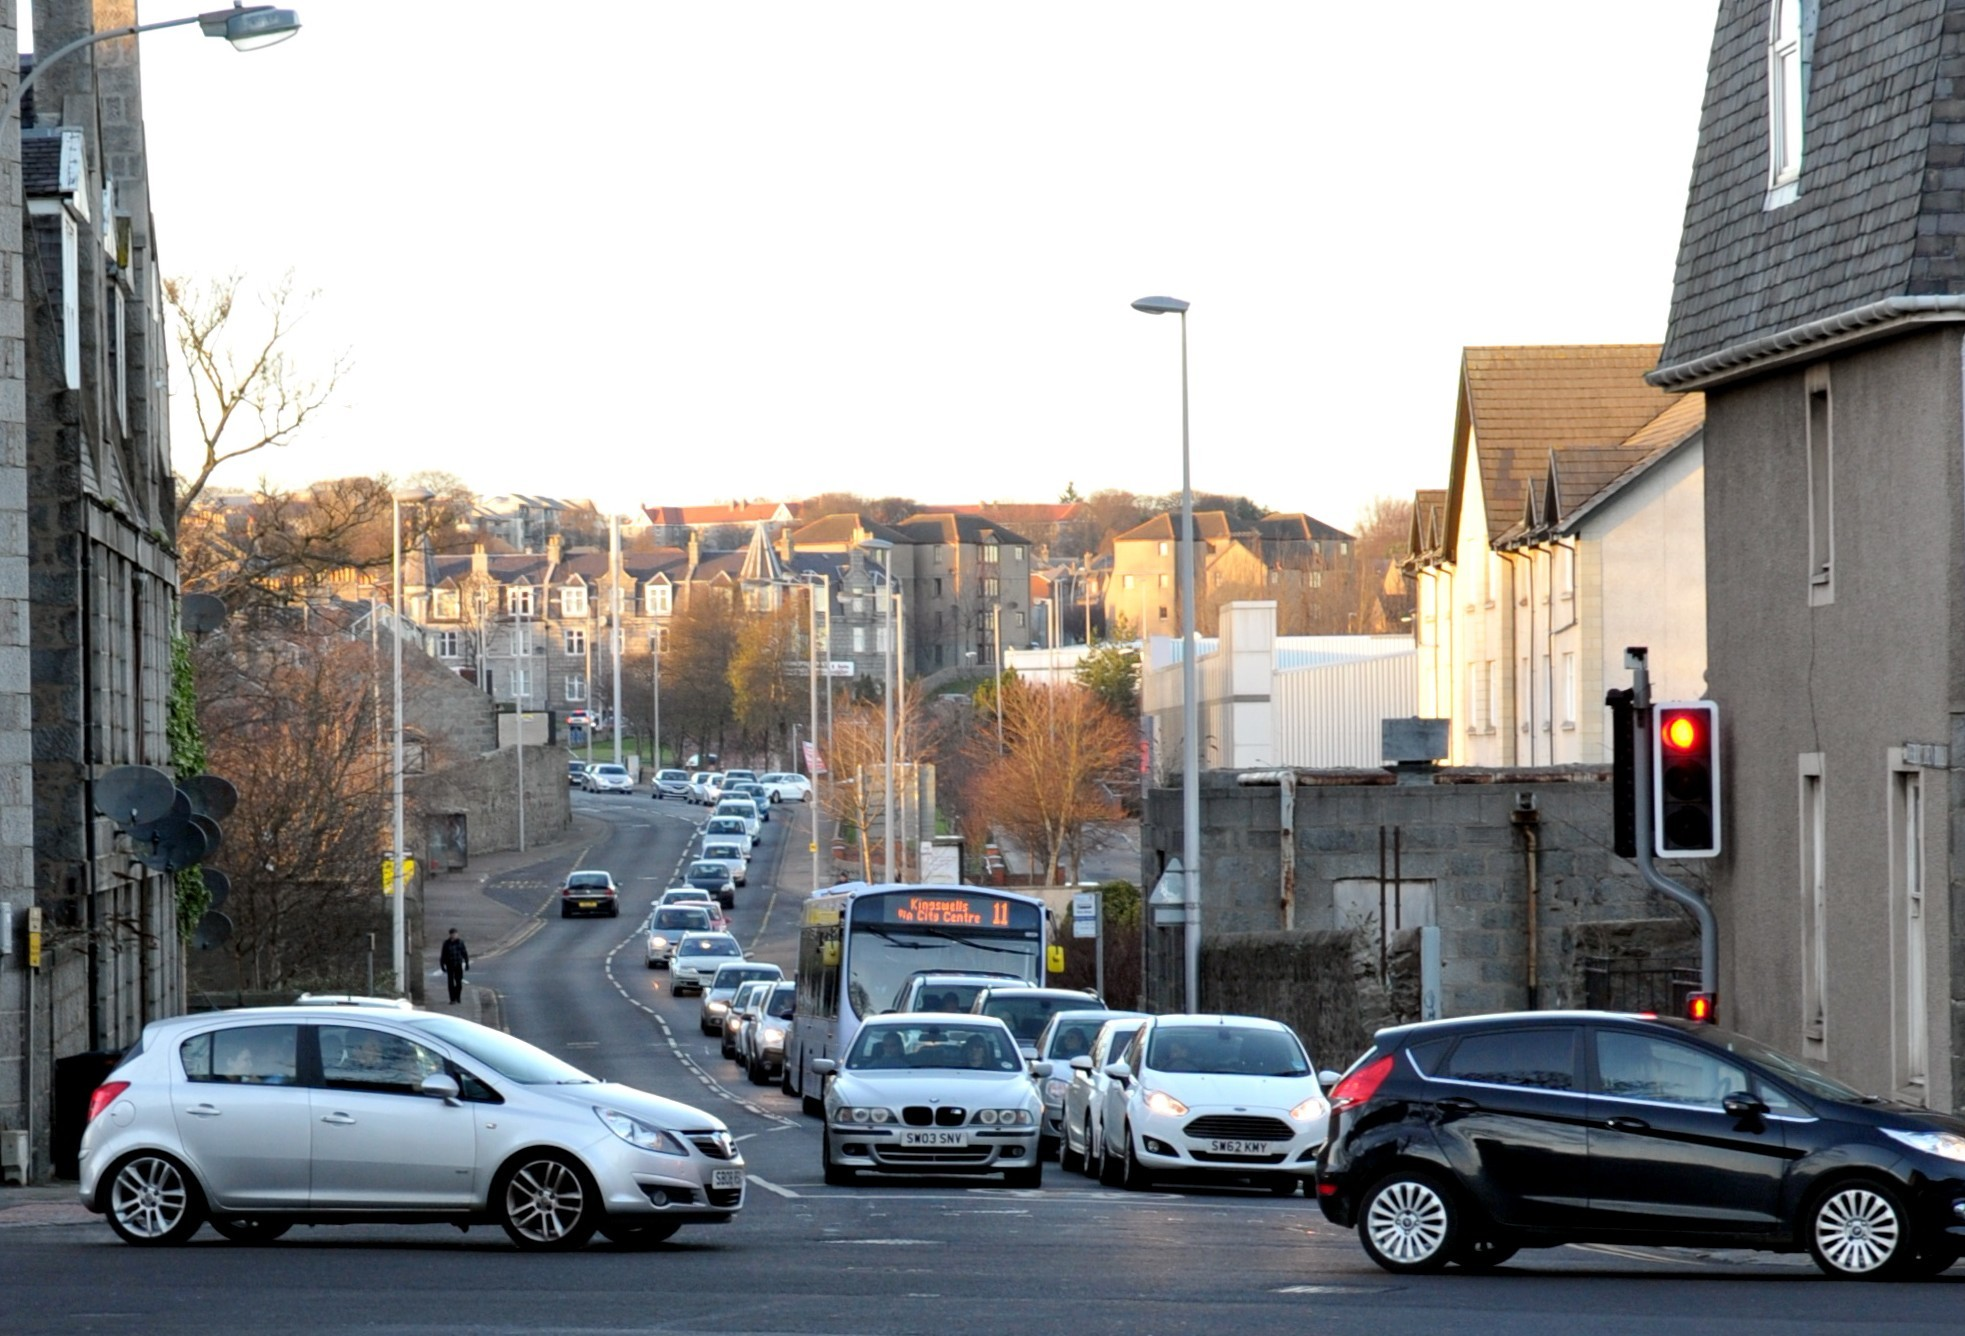 Berryden Road